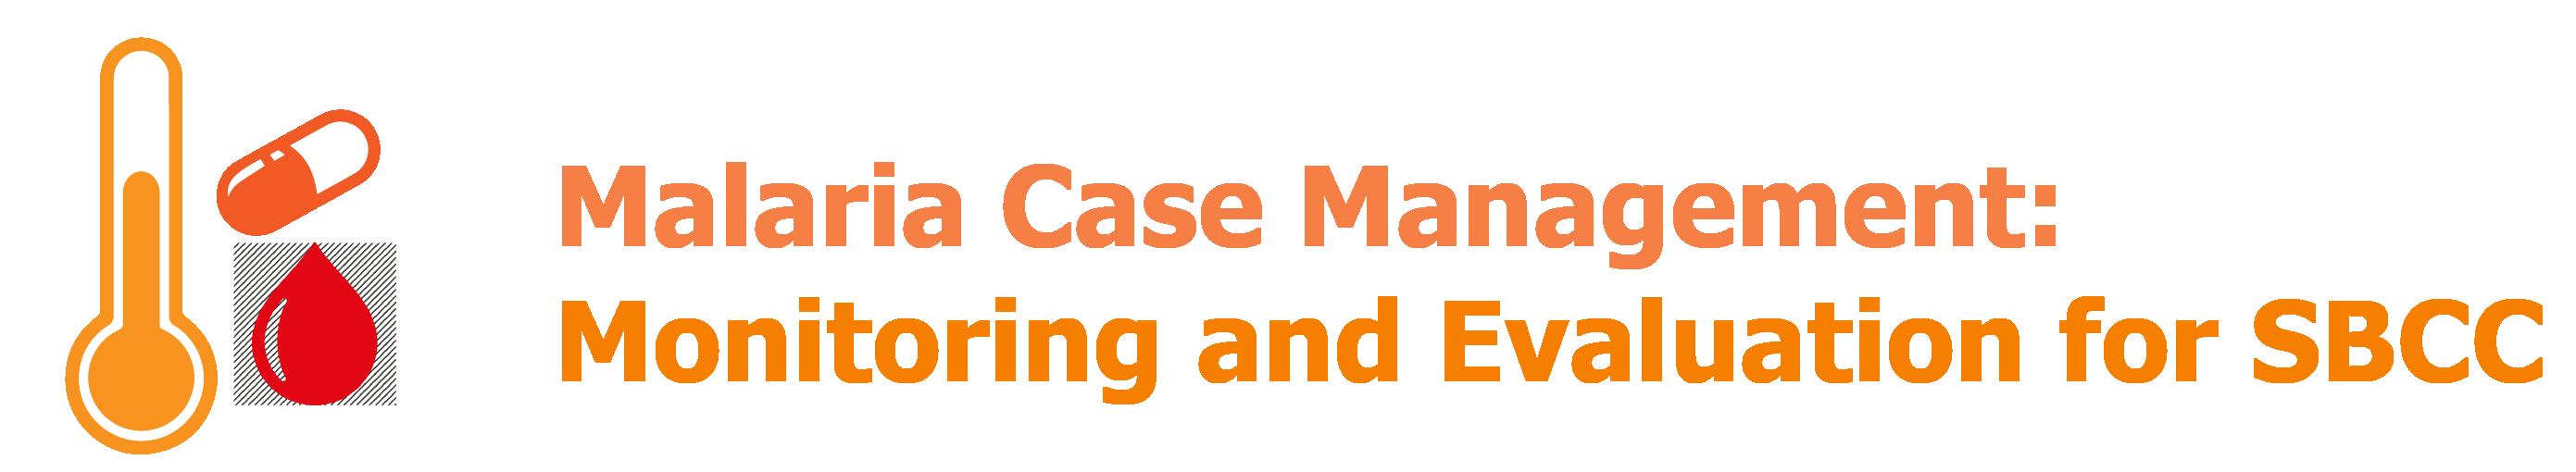 Fever clipart malaria symptom. Case management sbcc example